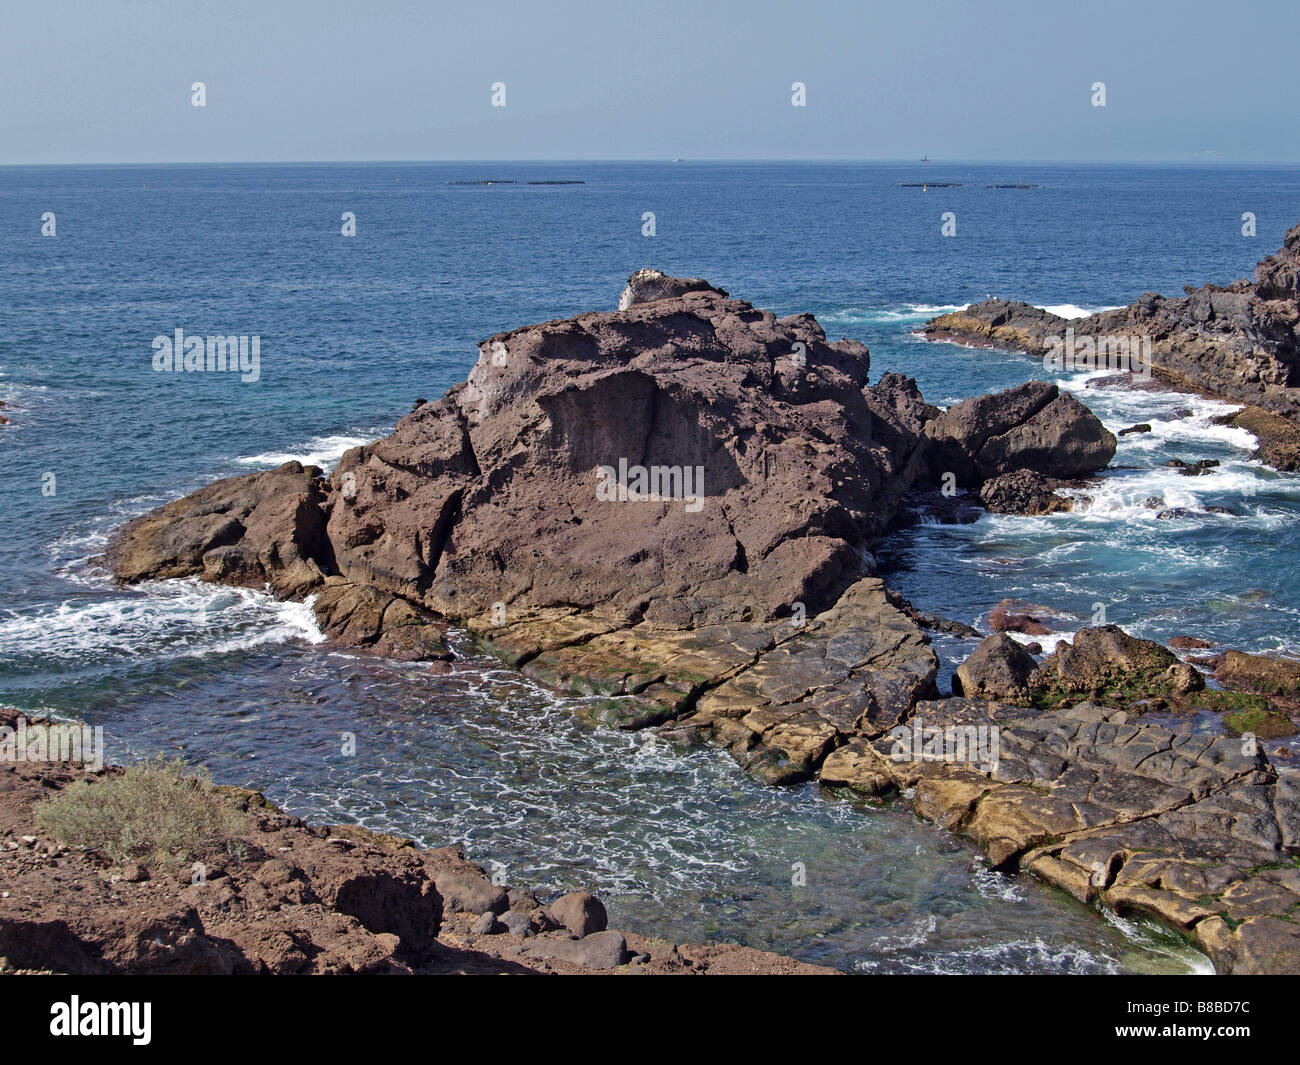 Sea braking on the volcanic rock coastline in Tenerife. - Stock Image